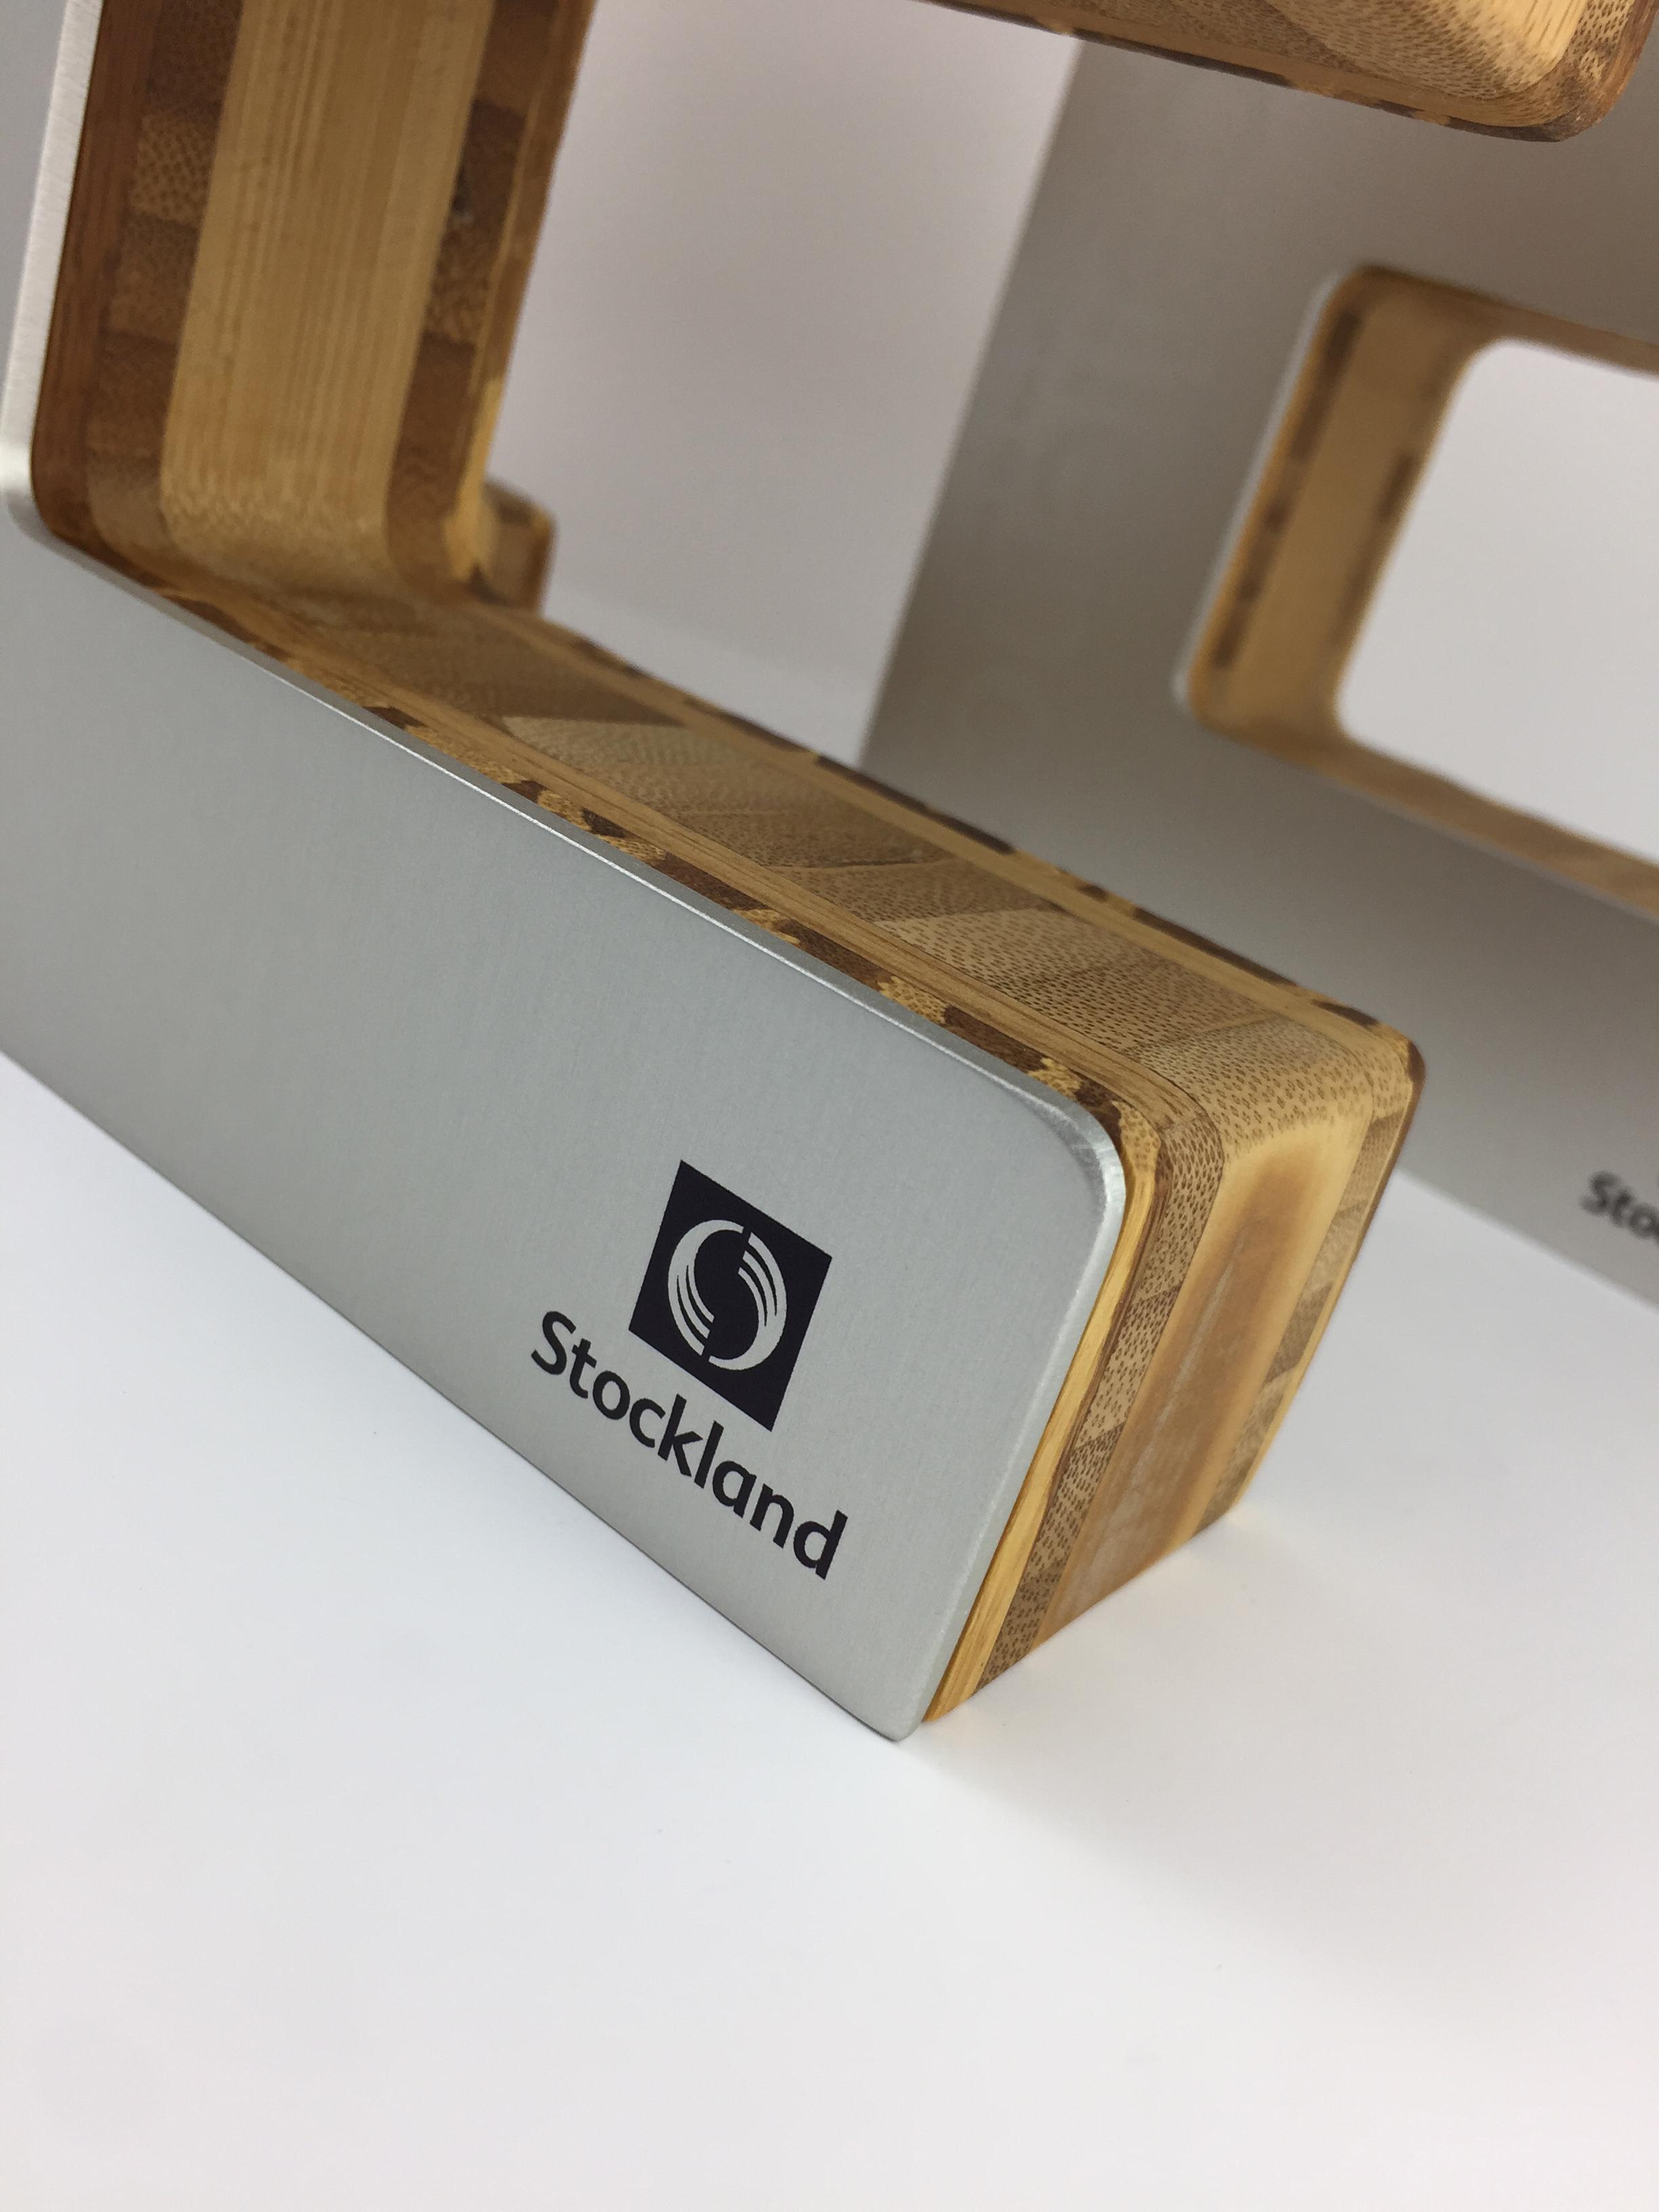 stockland-care-awards-eco-bamboo-plywood-timber-aluminium-trophy-06.jpg